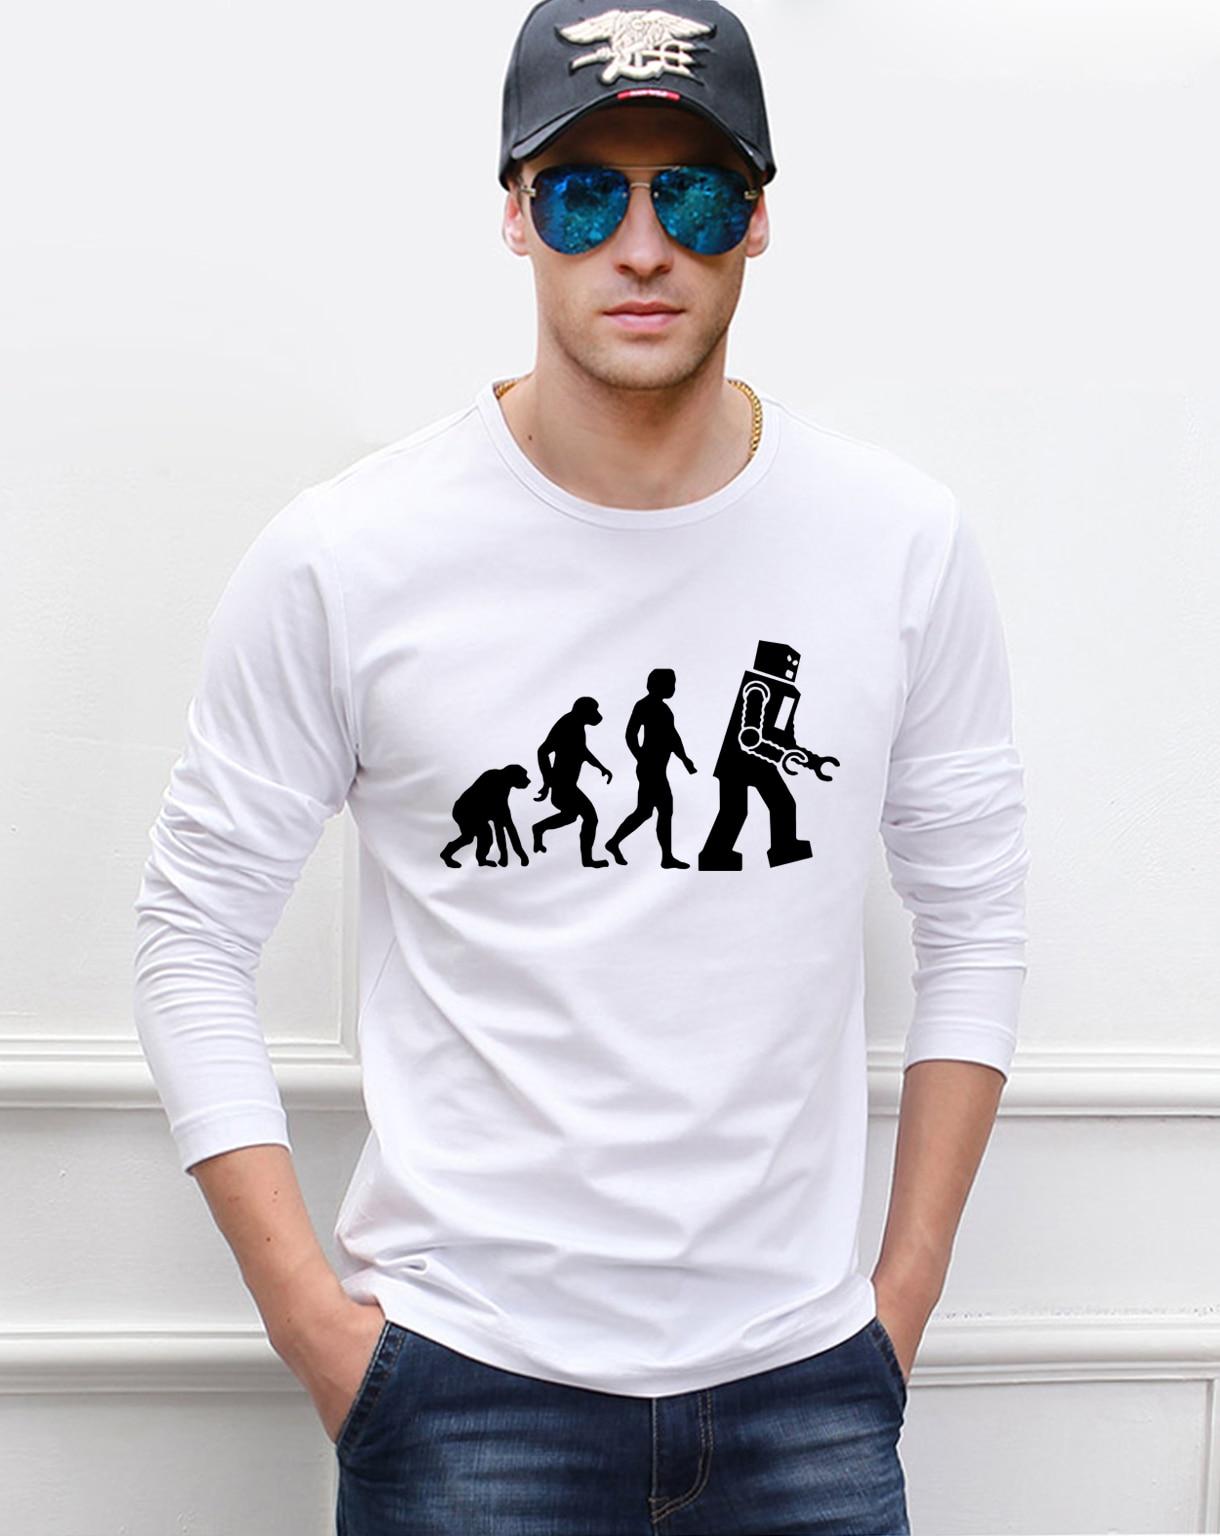 Camiseta de manga larga para hombre de la evolución robótica de The Big Bang Theory 2020 nueva Camiseta de algodón de alta calidad de hip hop fitness para hombre de otoño 100%